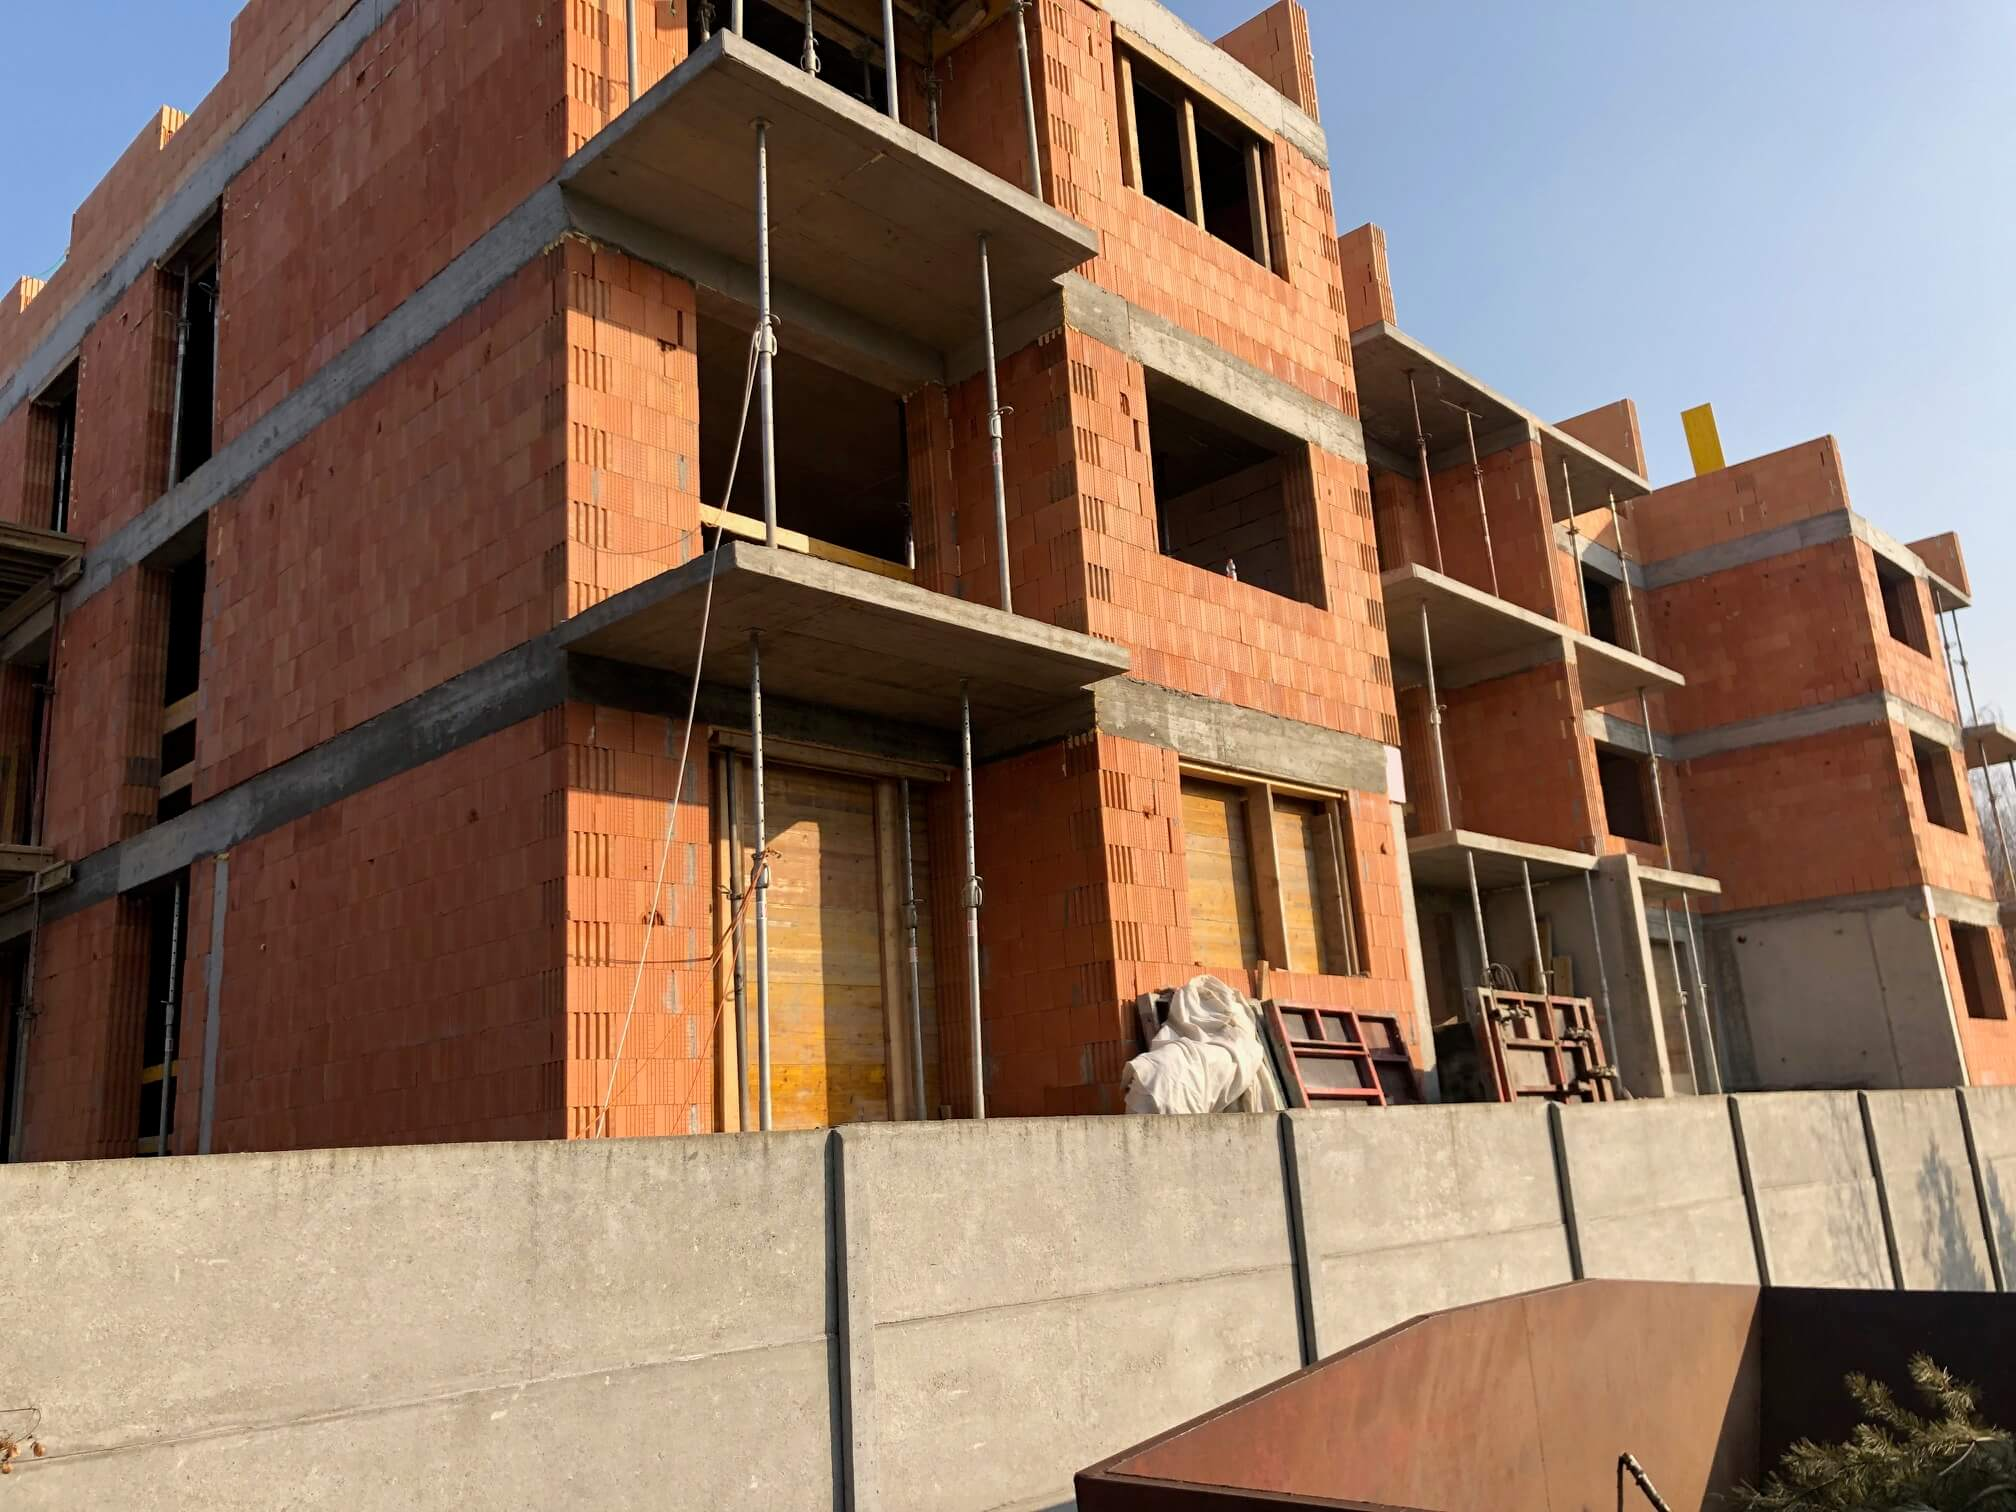 Novostavba 3 Izbový, M-House, Malacky centrum, 70,05m2, Loggia 7,48m2-17